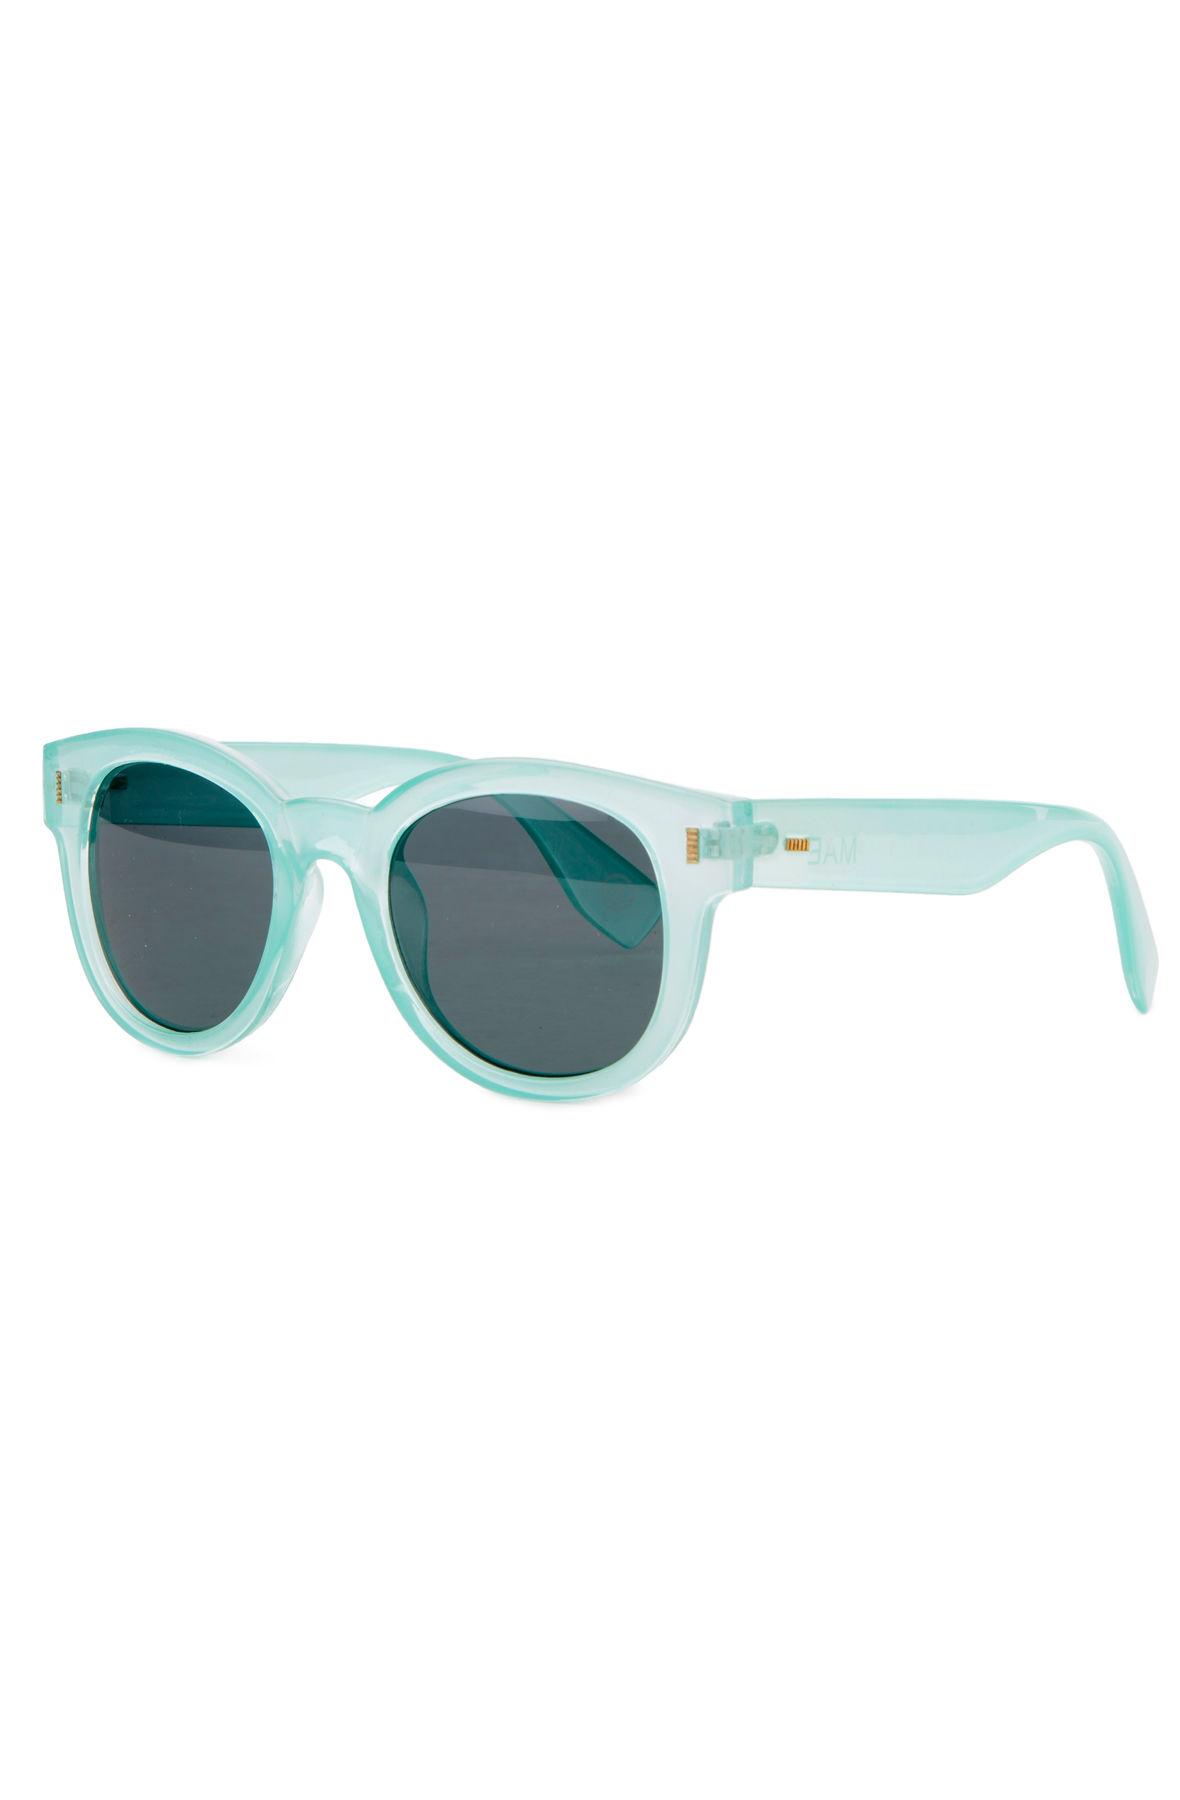 The Mae Cateye Sunglasses in Mint